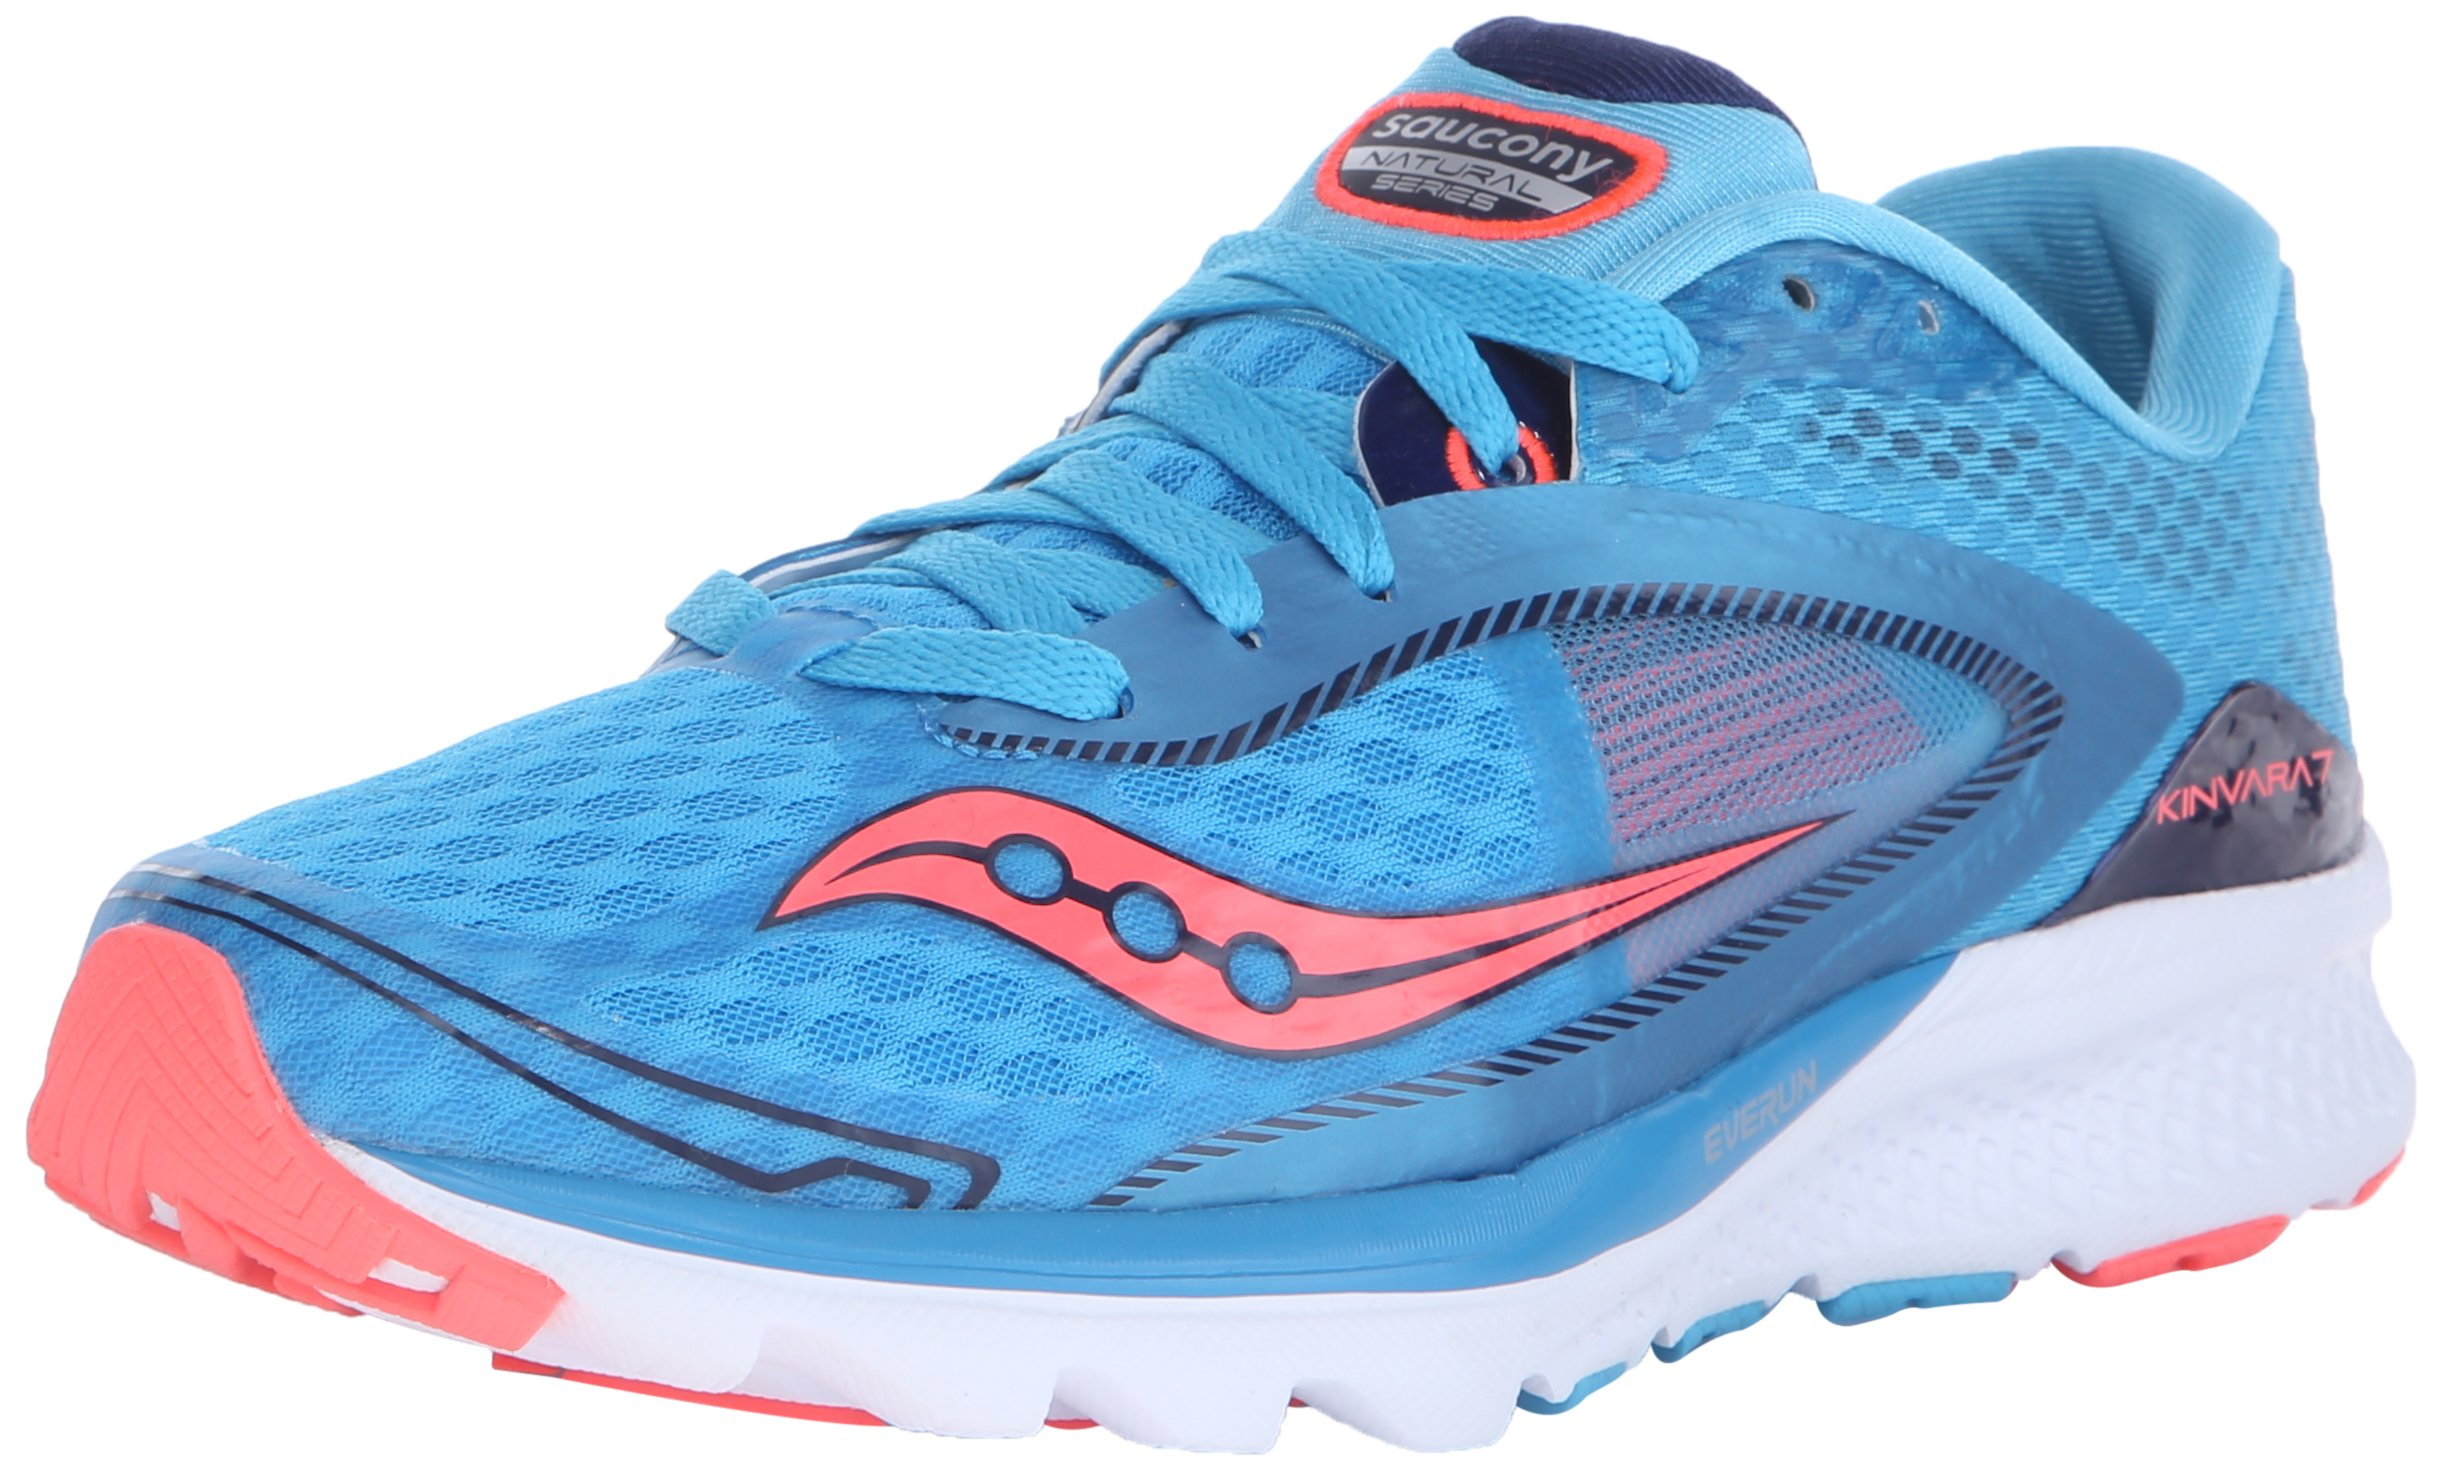 Saucony Women's Kinvara 7 Running Shoe, Blue/Navy/Citron, 11 M US